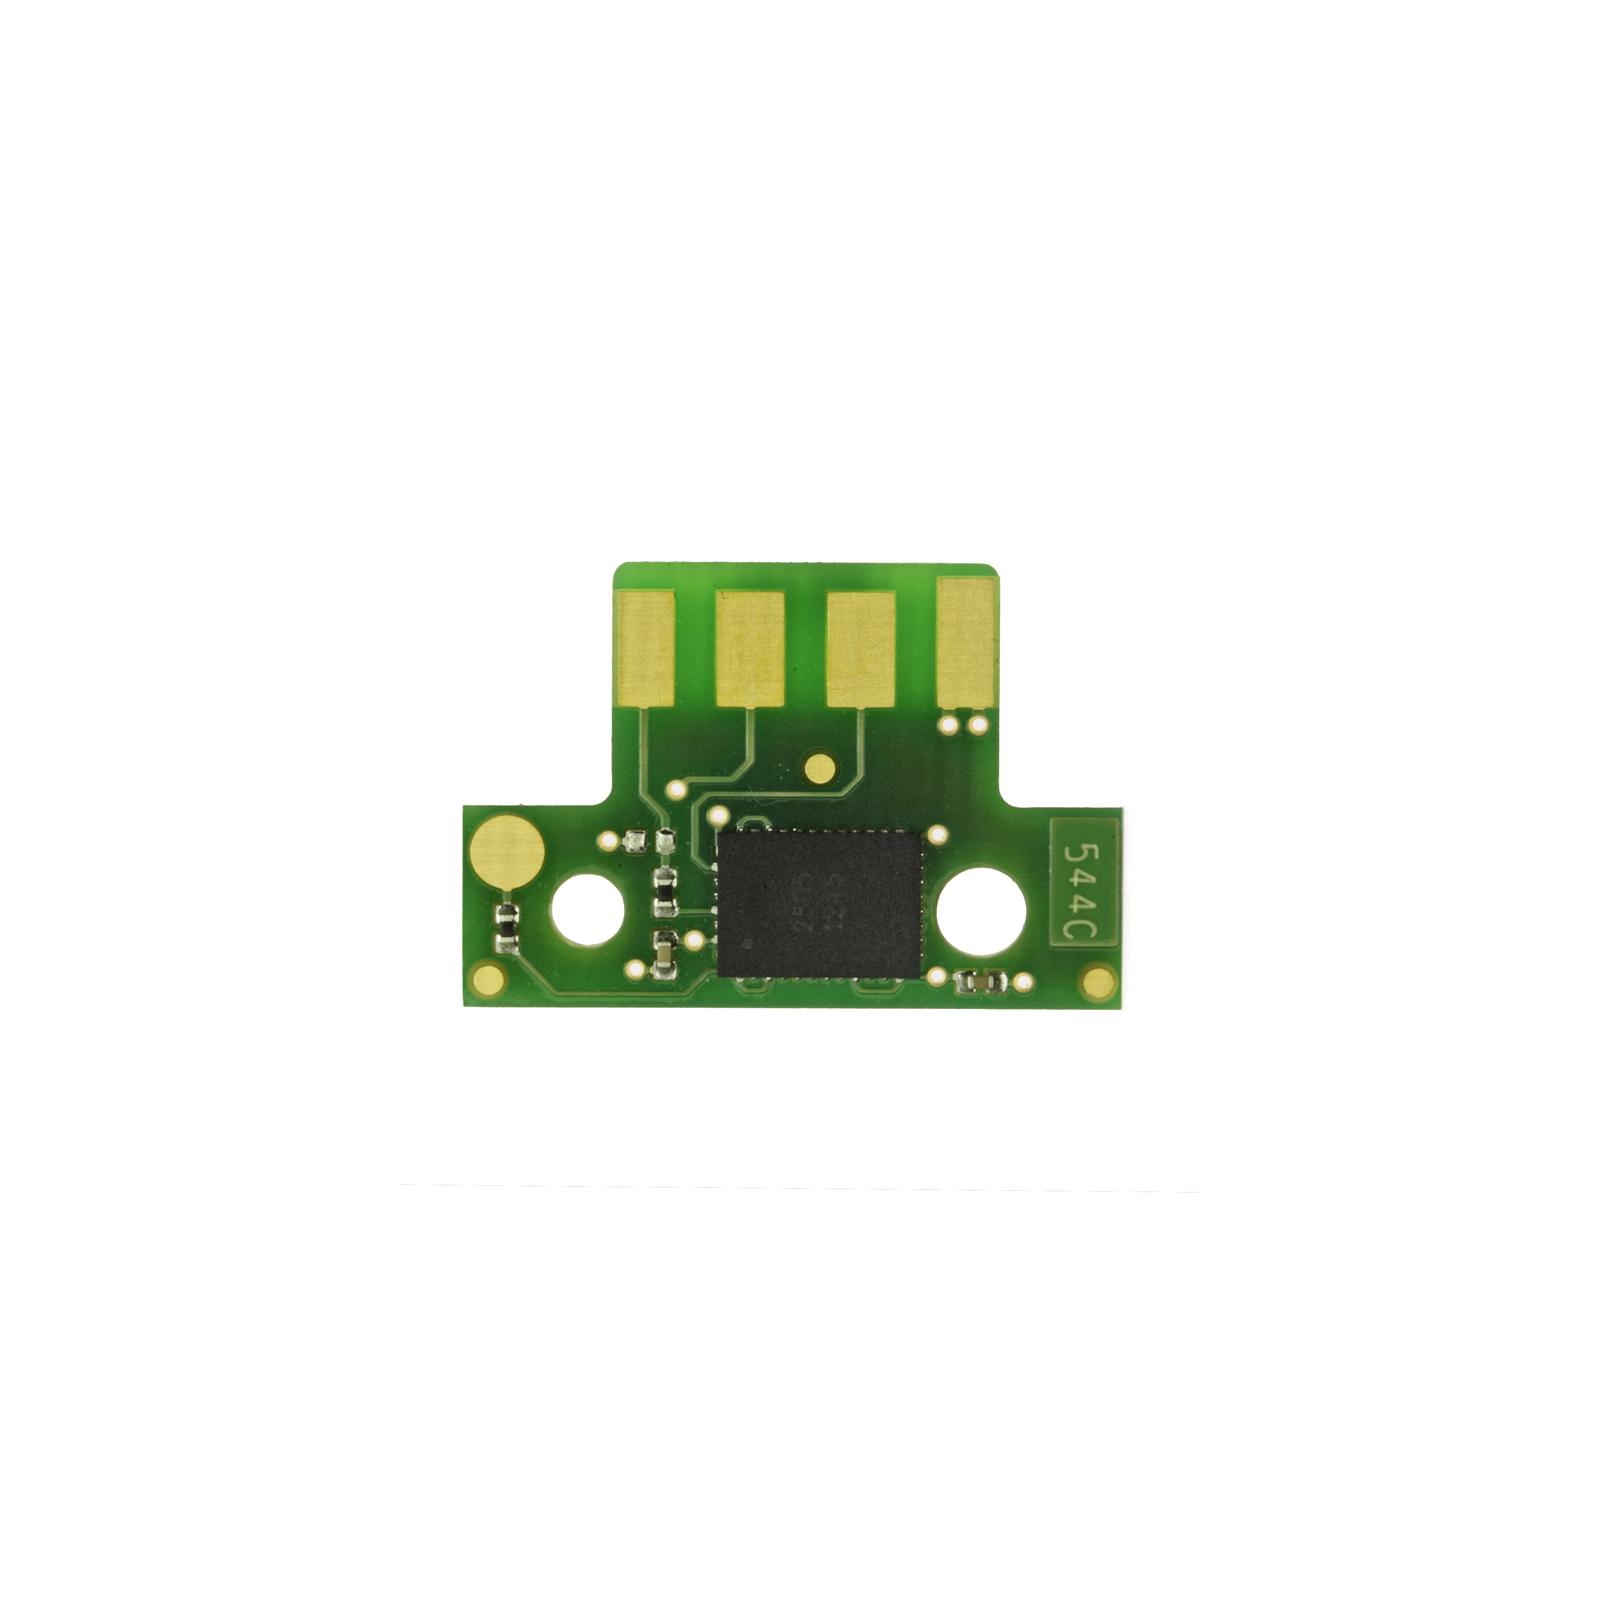 Чип для картриджа LexmarkC544/X544 (C544X1CG/C544X2CG) 4k cyan Static Control (LC544CHIP-C)